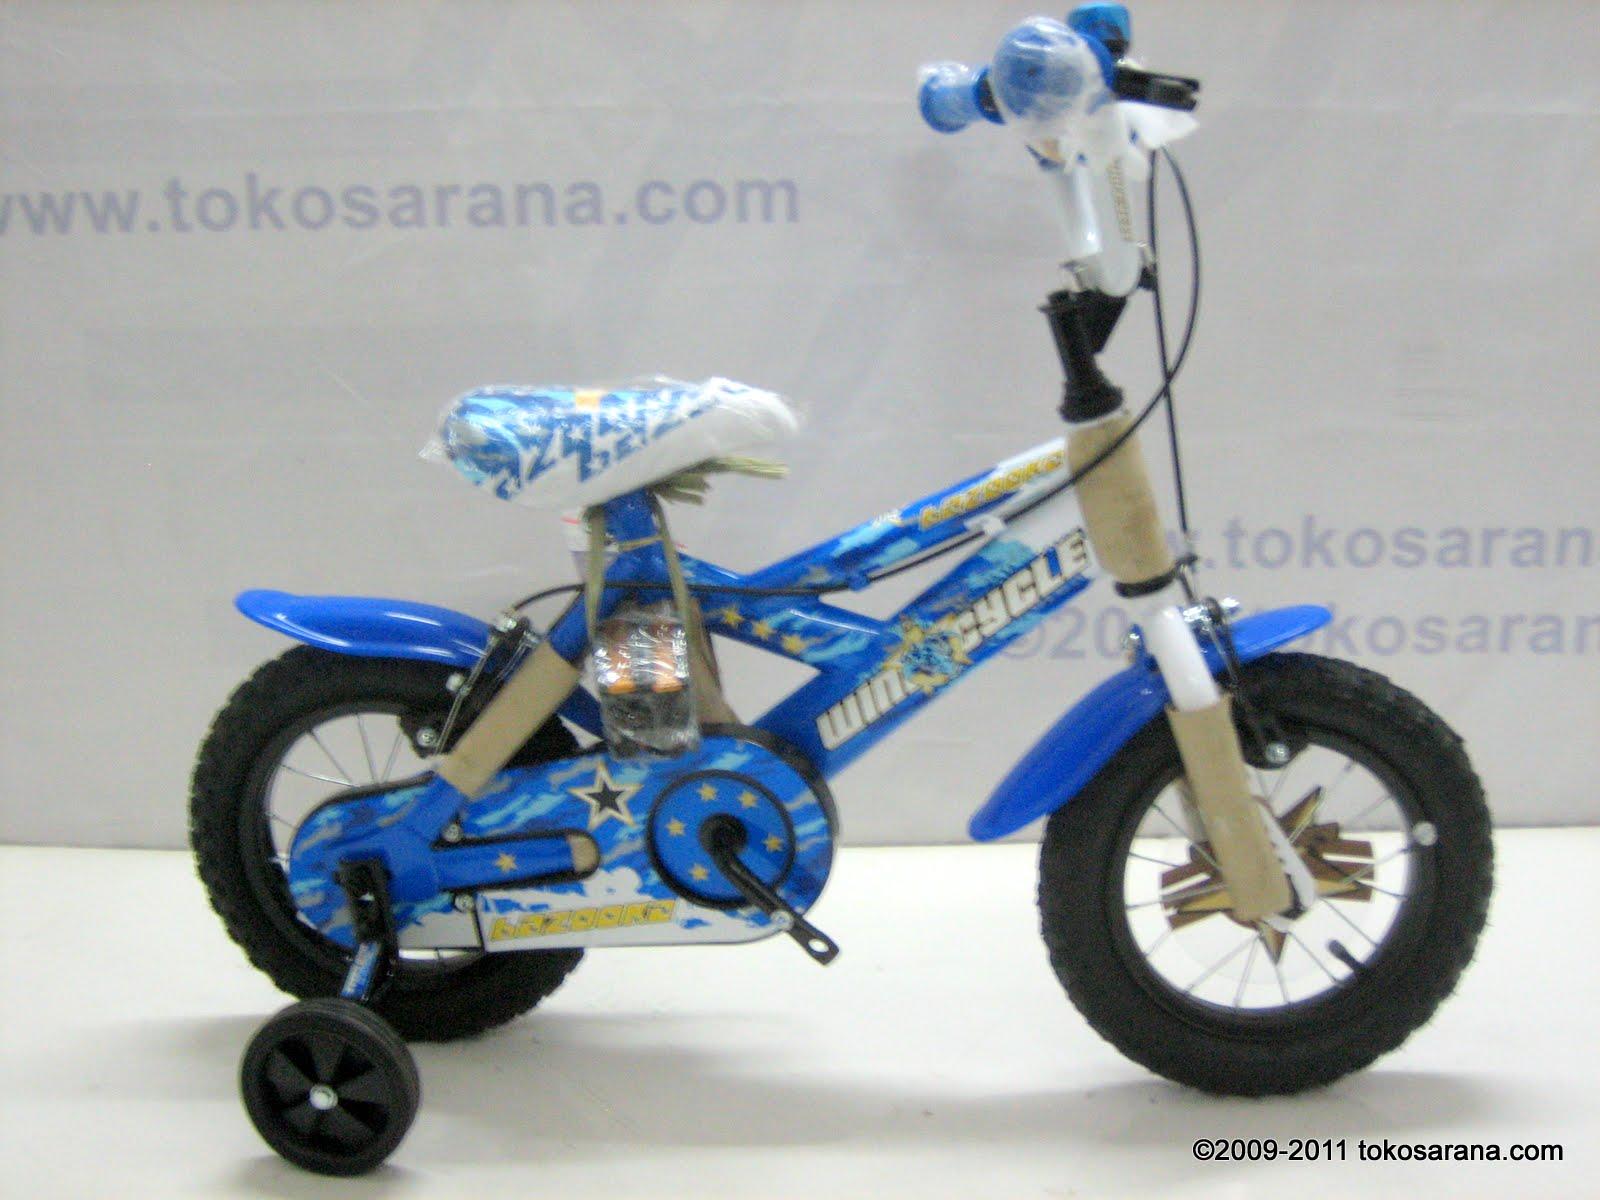 tokomagenta: A Showcase of Products: Sepeda Anak WIMCYCLE